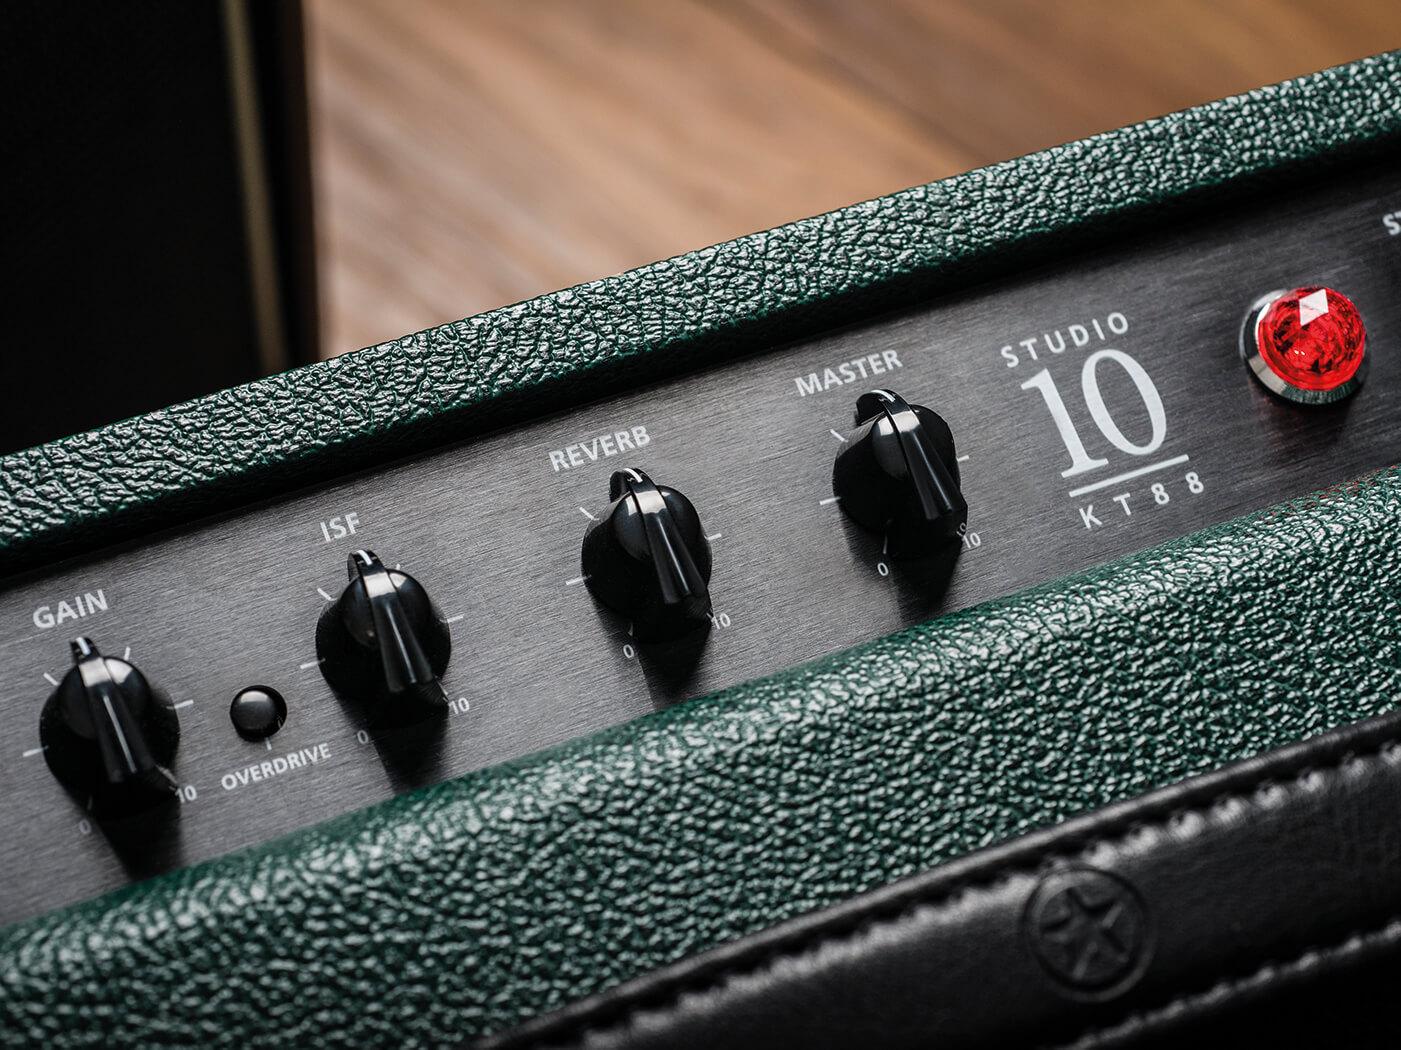 Blackstar Studio Review 10KT88